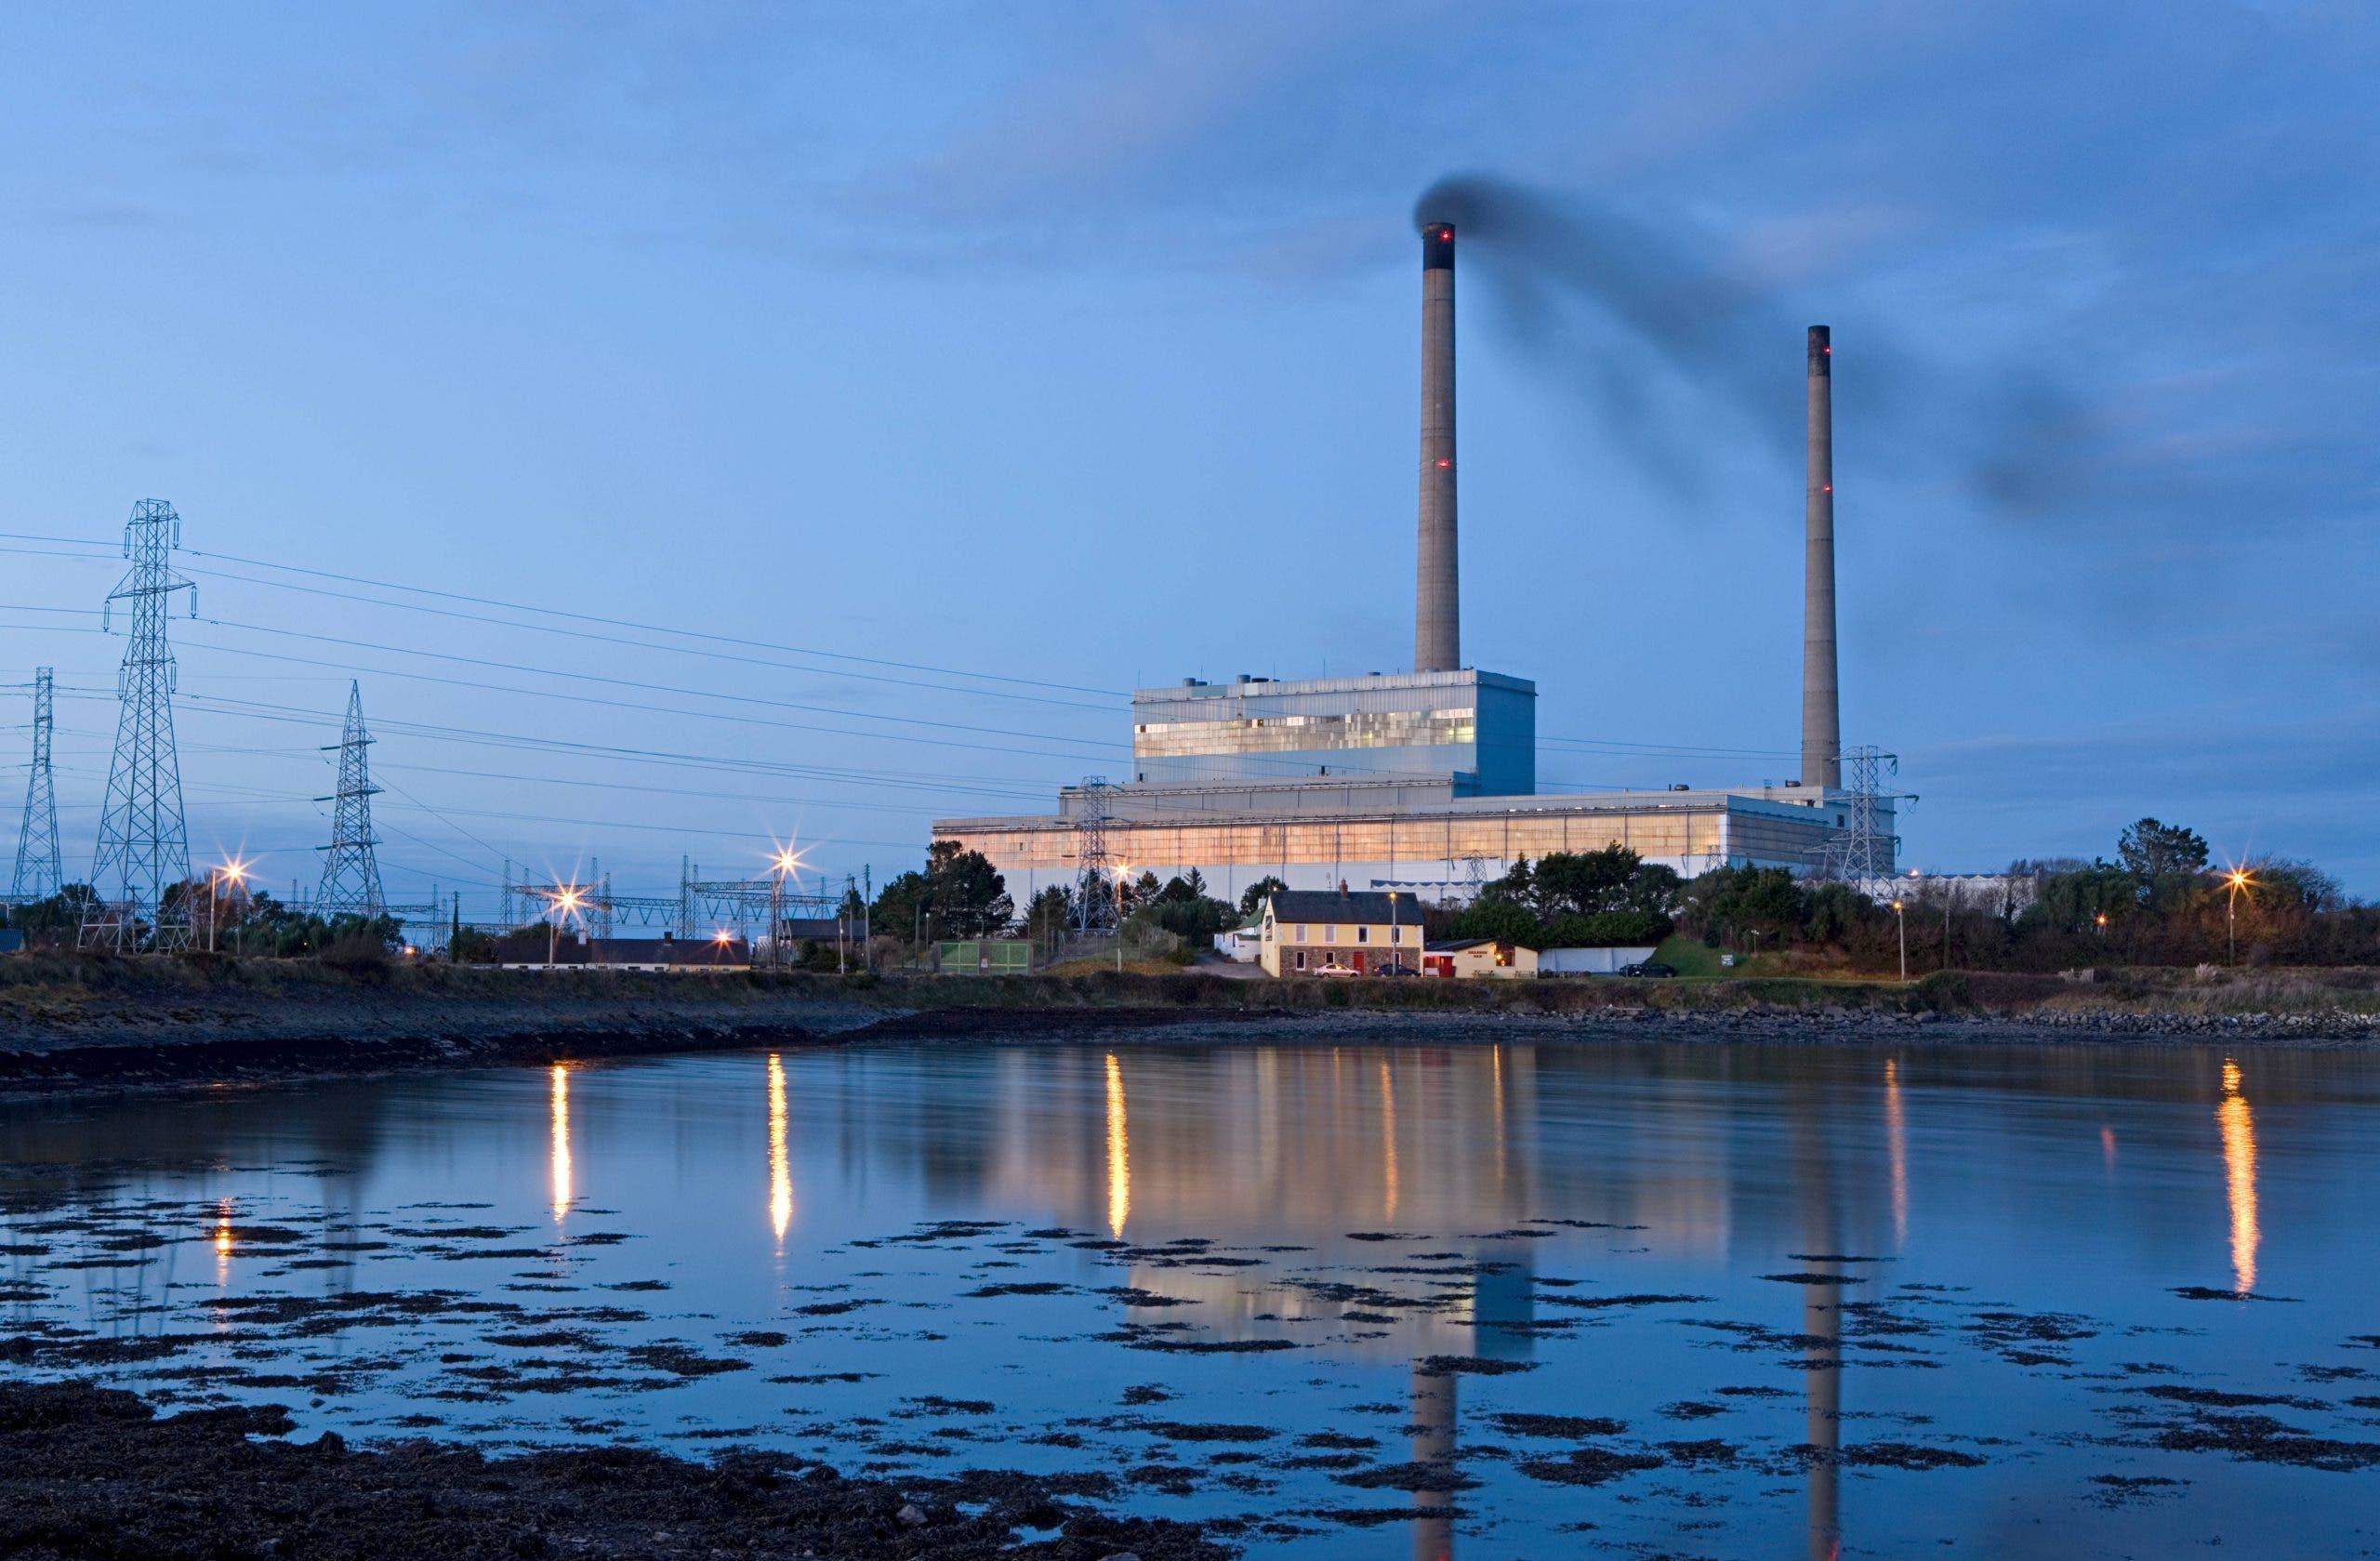 Tarbert Island Power Station